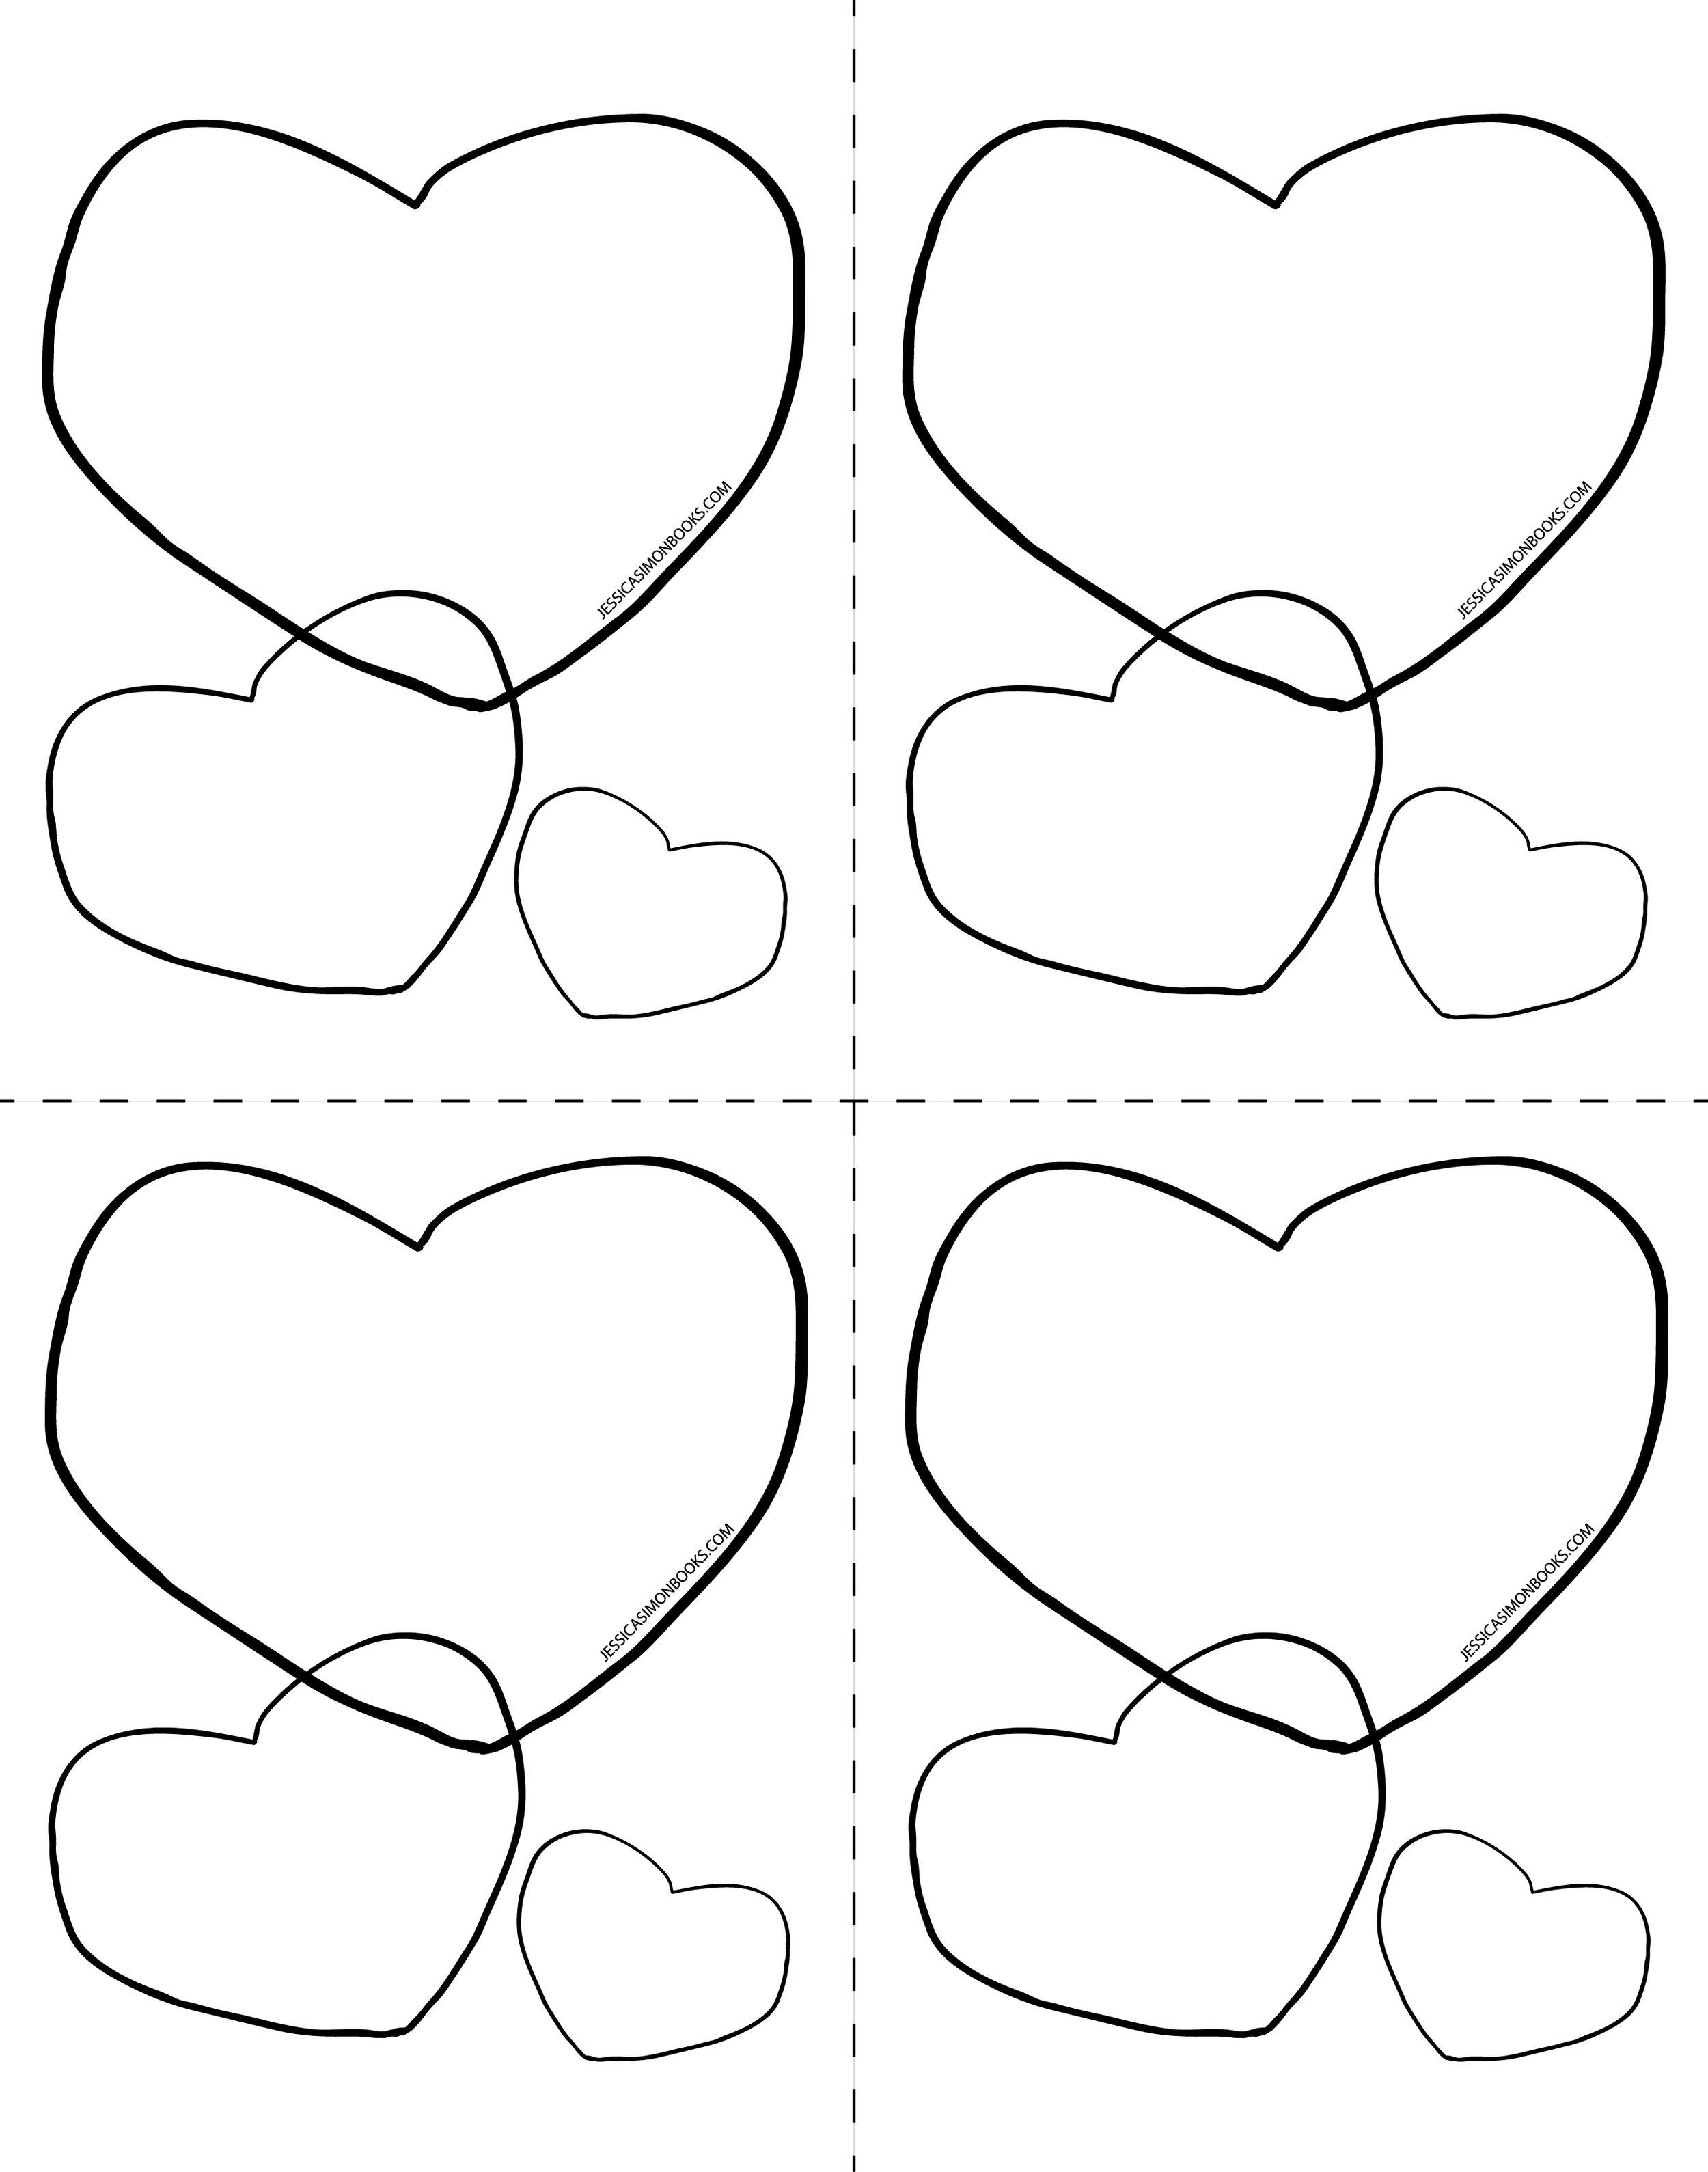 Heart Print Out_web.jpg